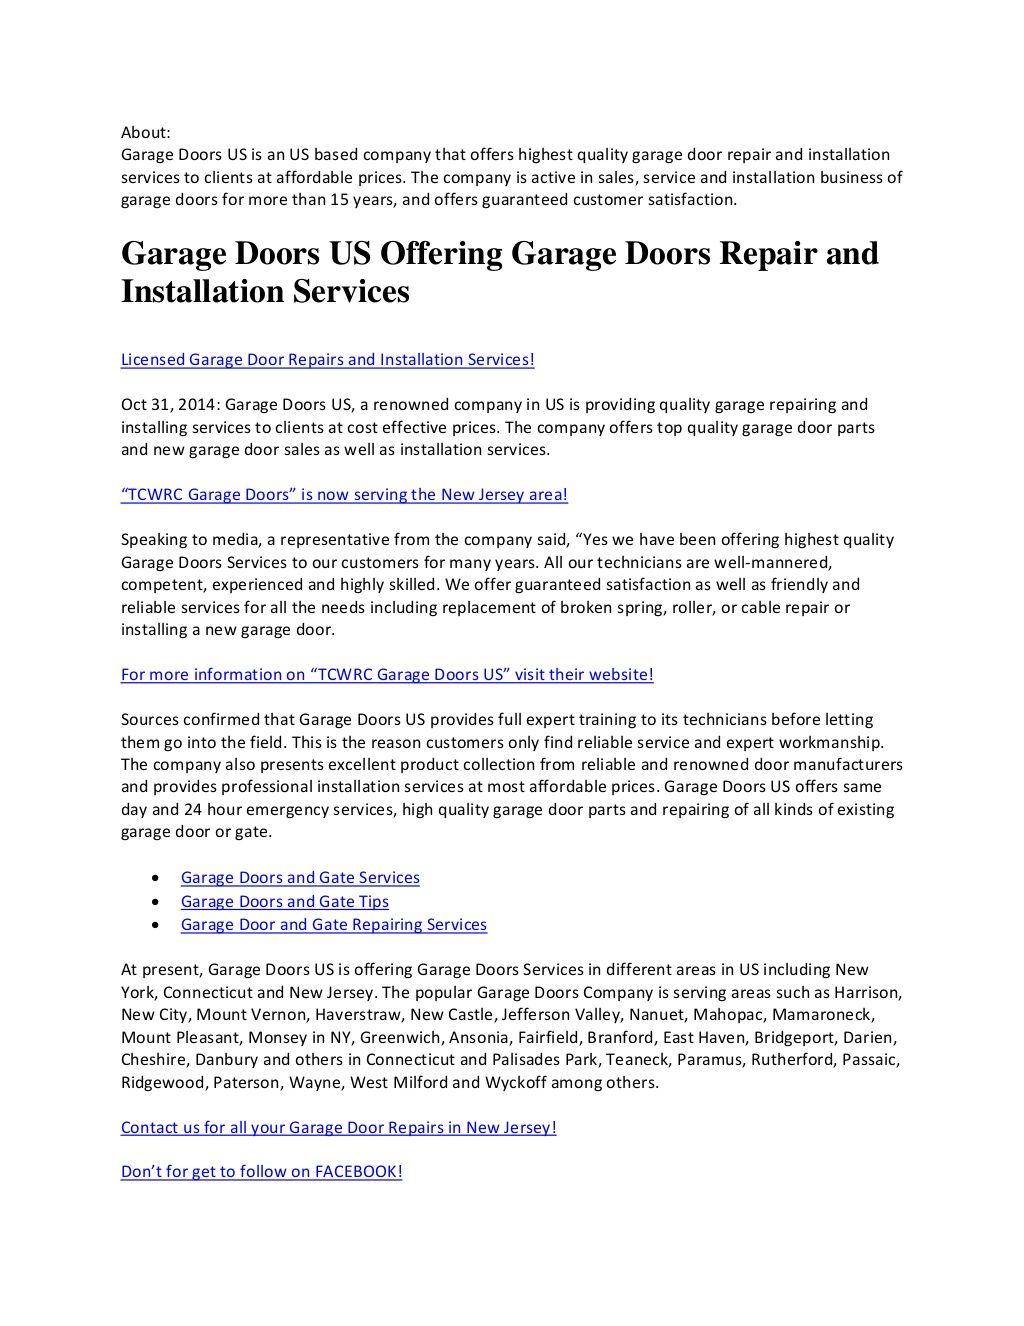 Tcwrc Garage Doors Us By Garage Doors Us Via Slideshare Gates And